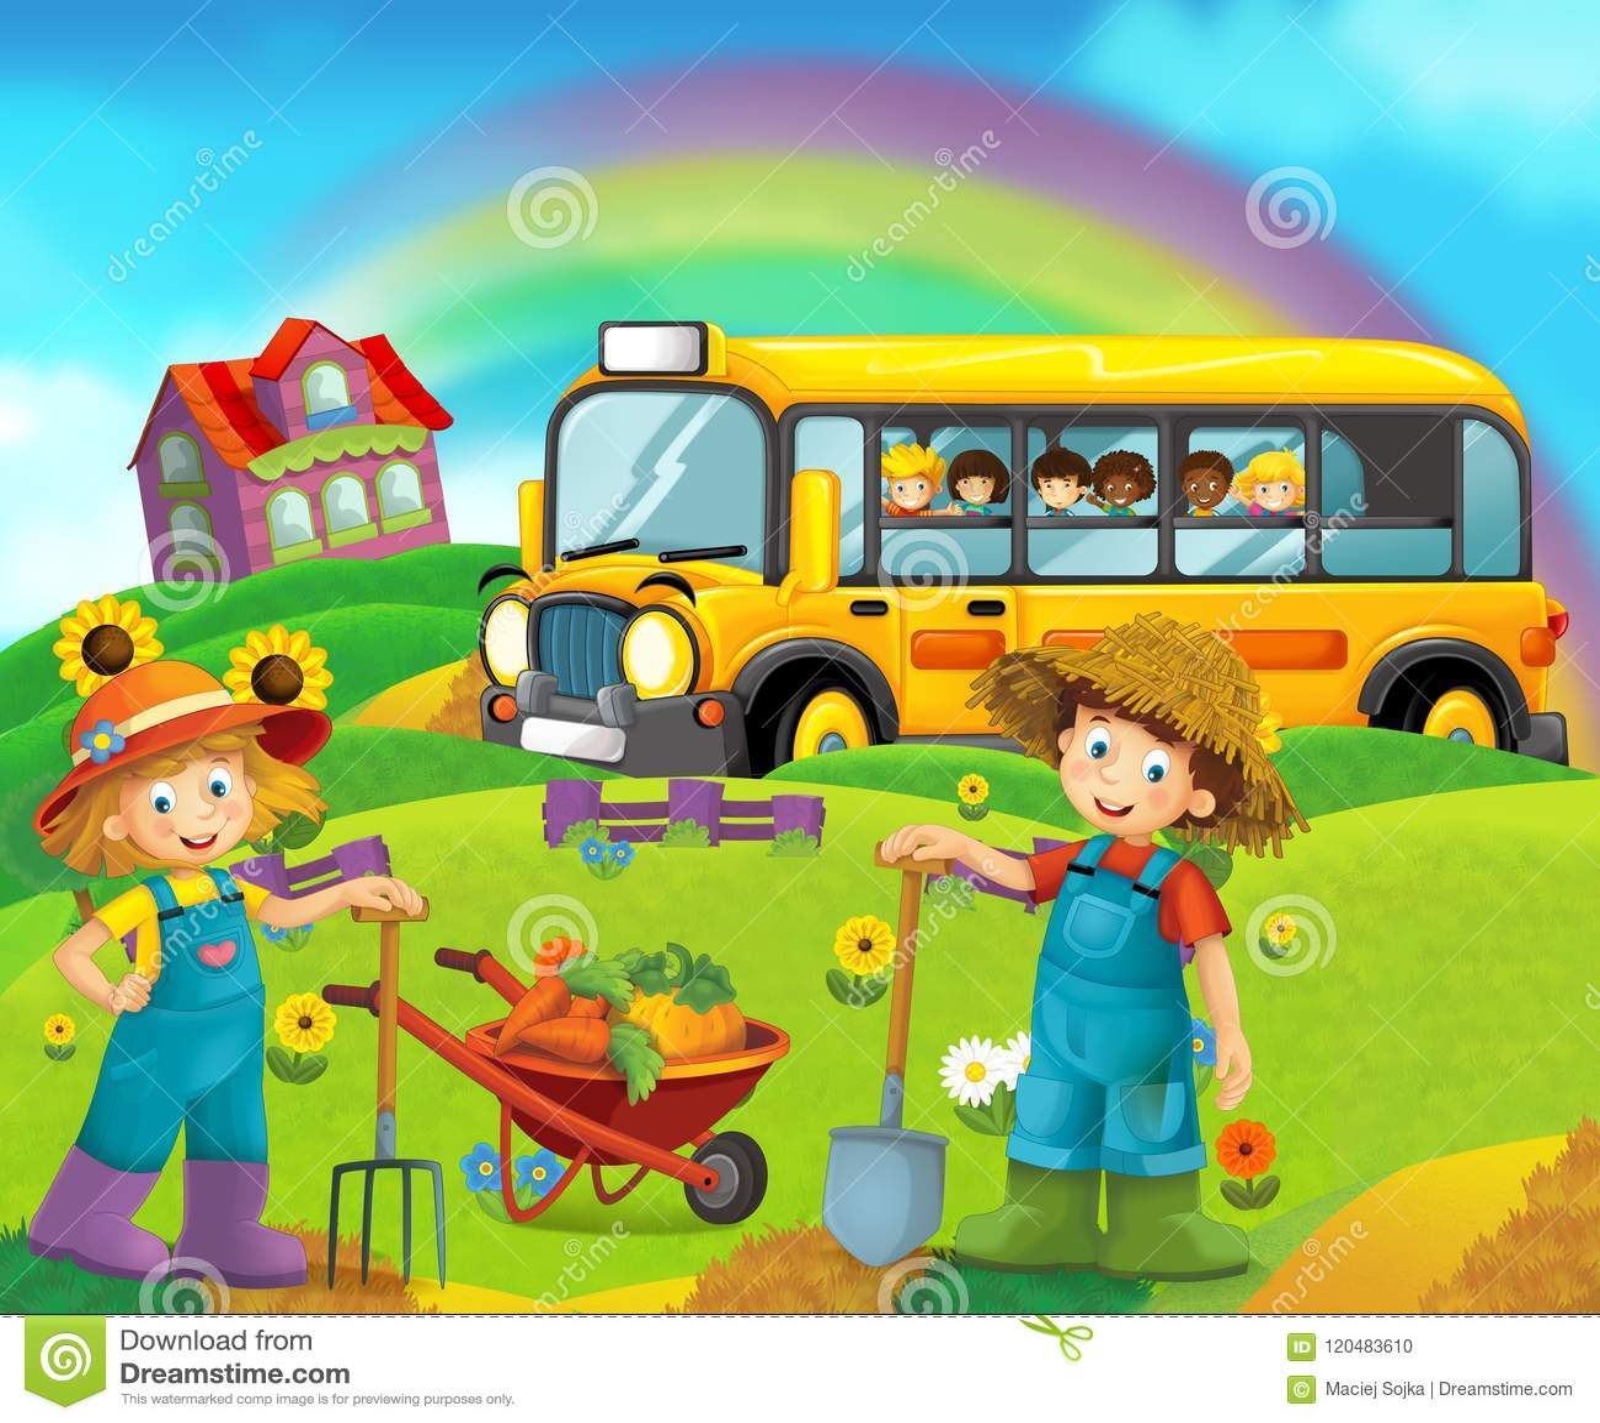 Cartoon Scene With Children On The Farm Having Fun And School Bus